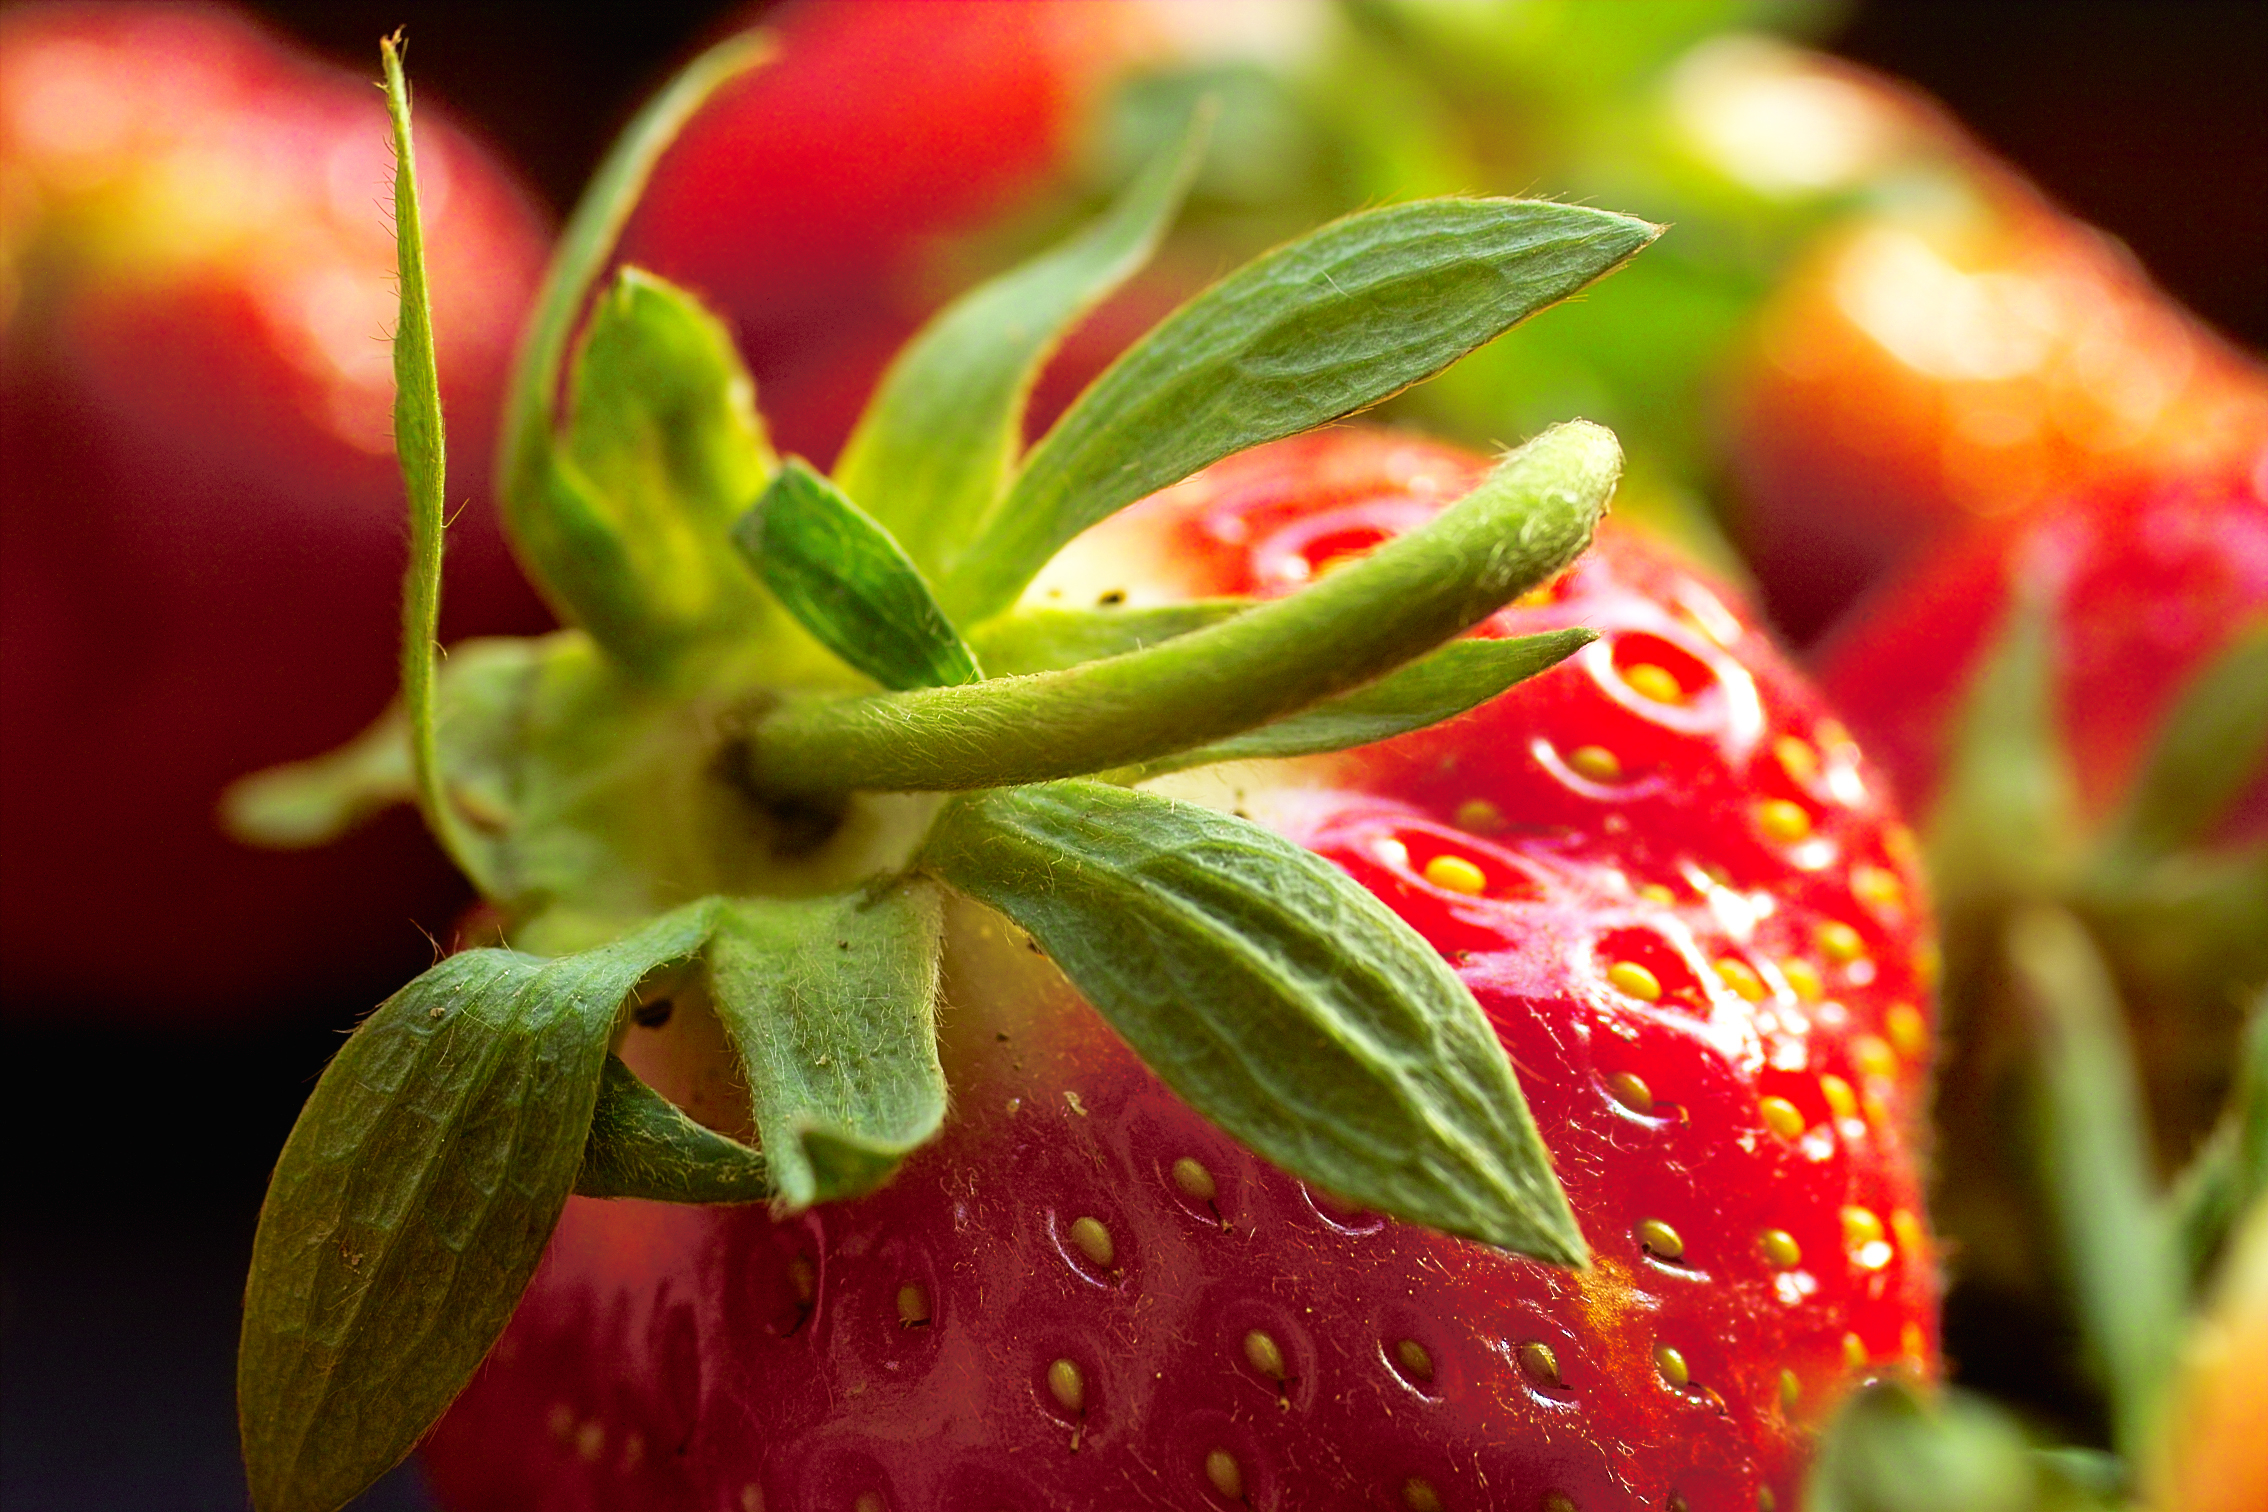 Food Fruit Strawberry 2268x1512